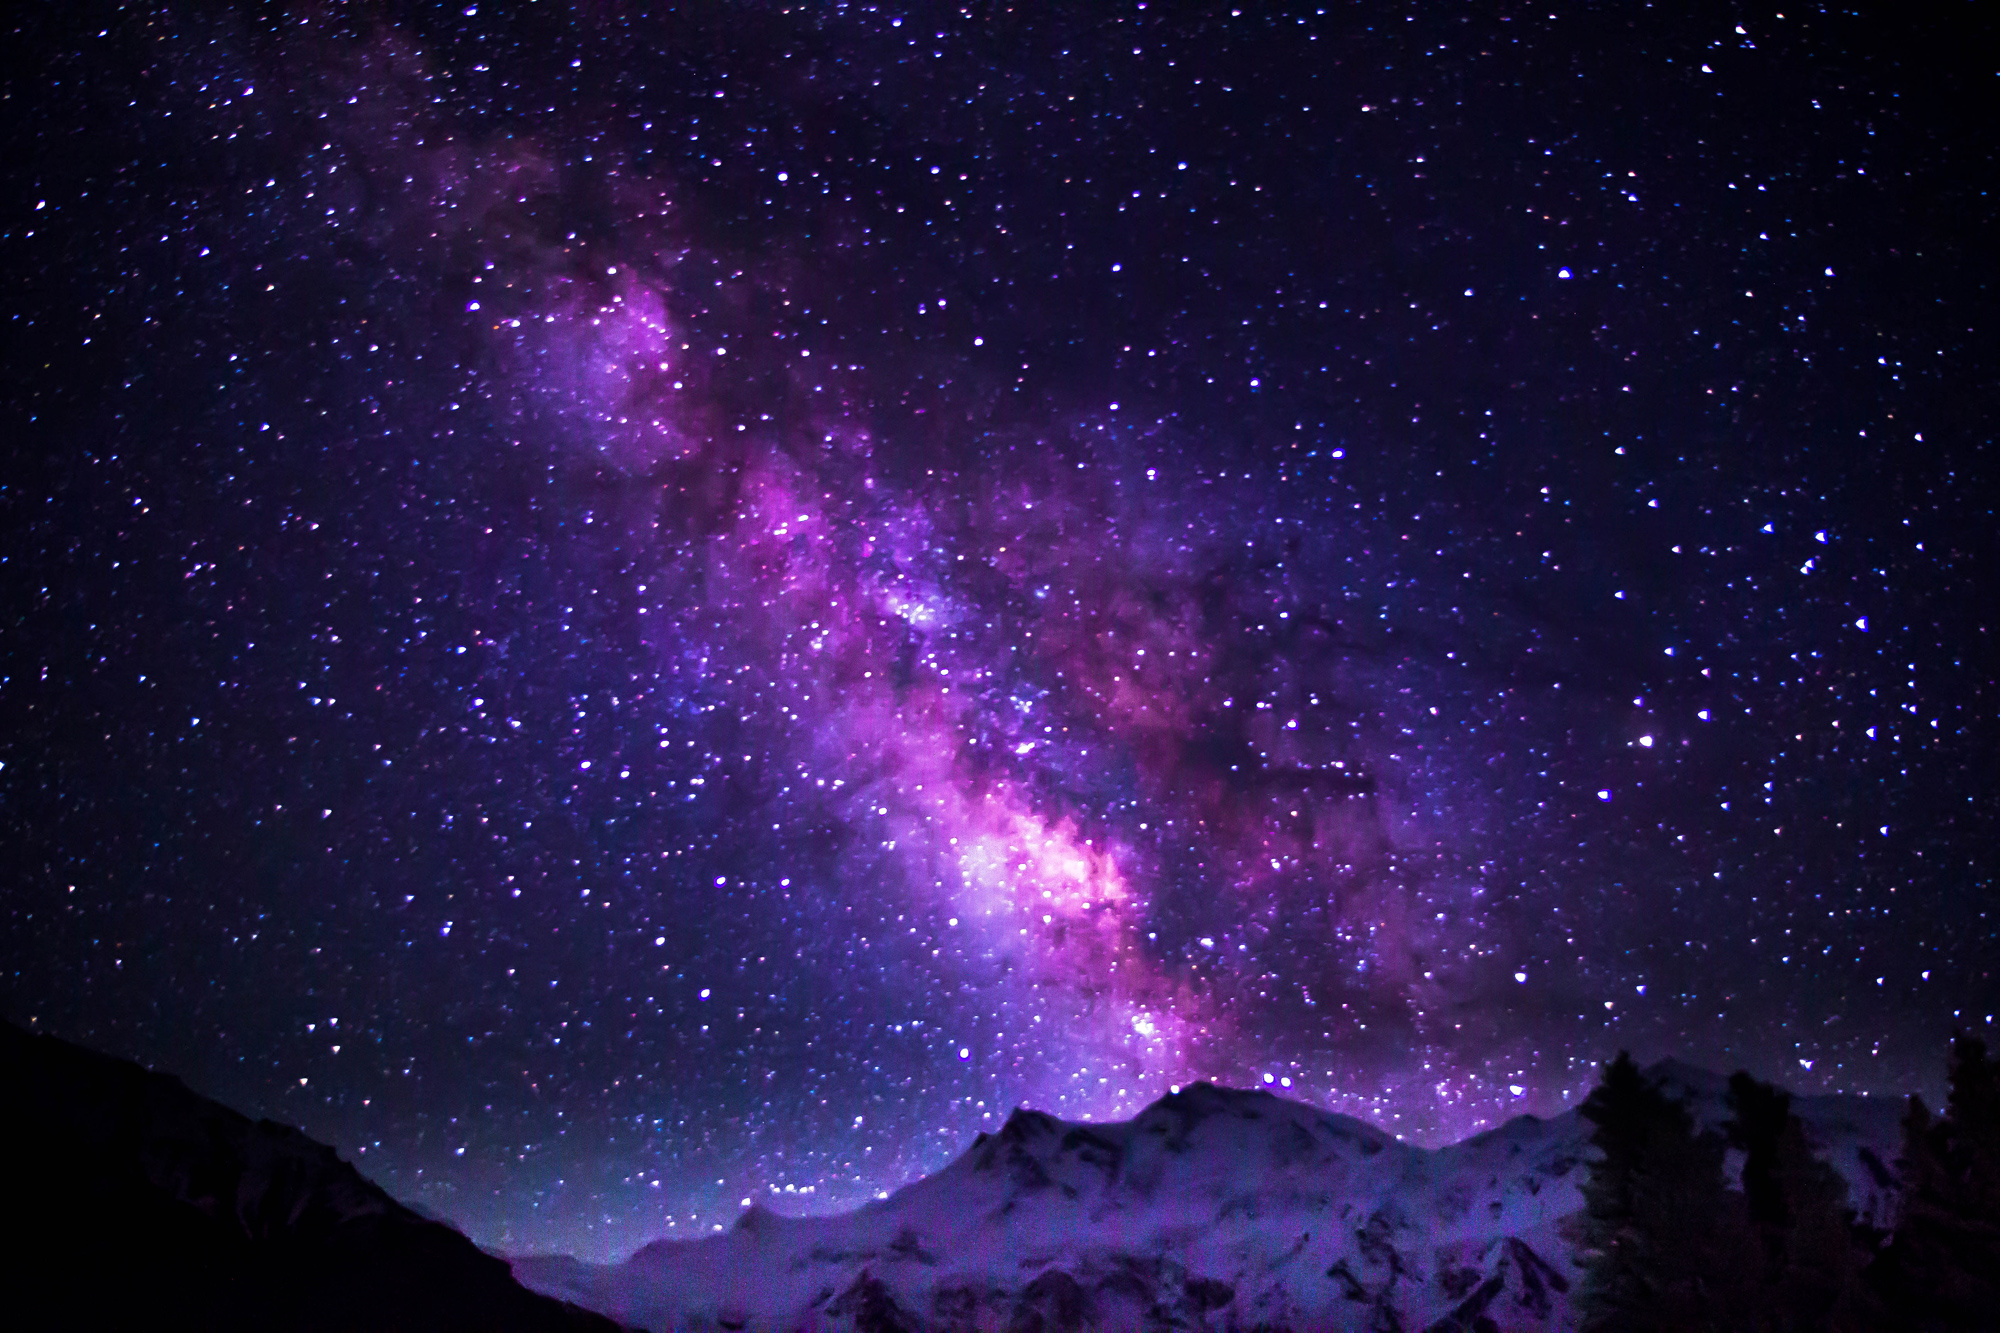 milky-way-galaxy-shimmering-over-nanga-parbat.jpg